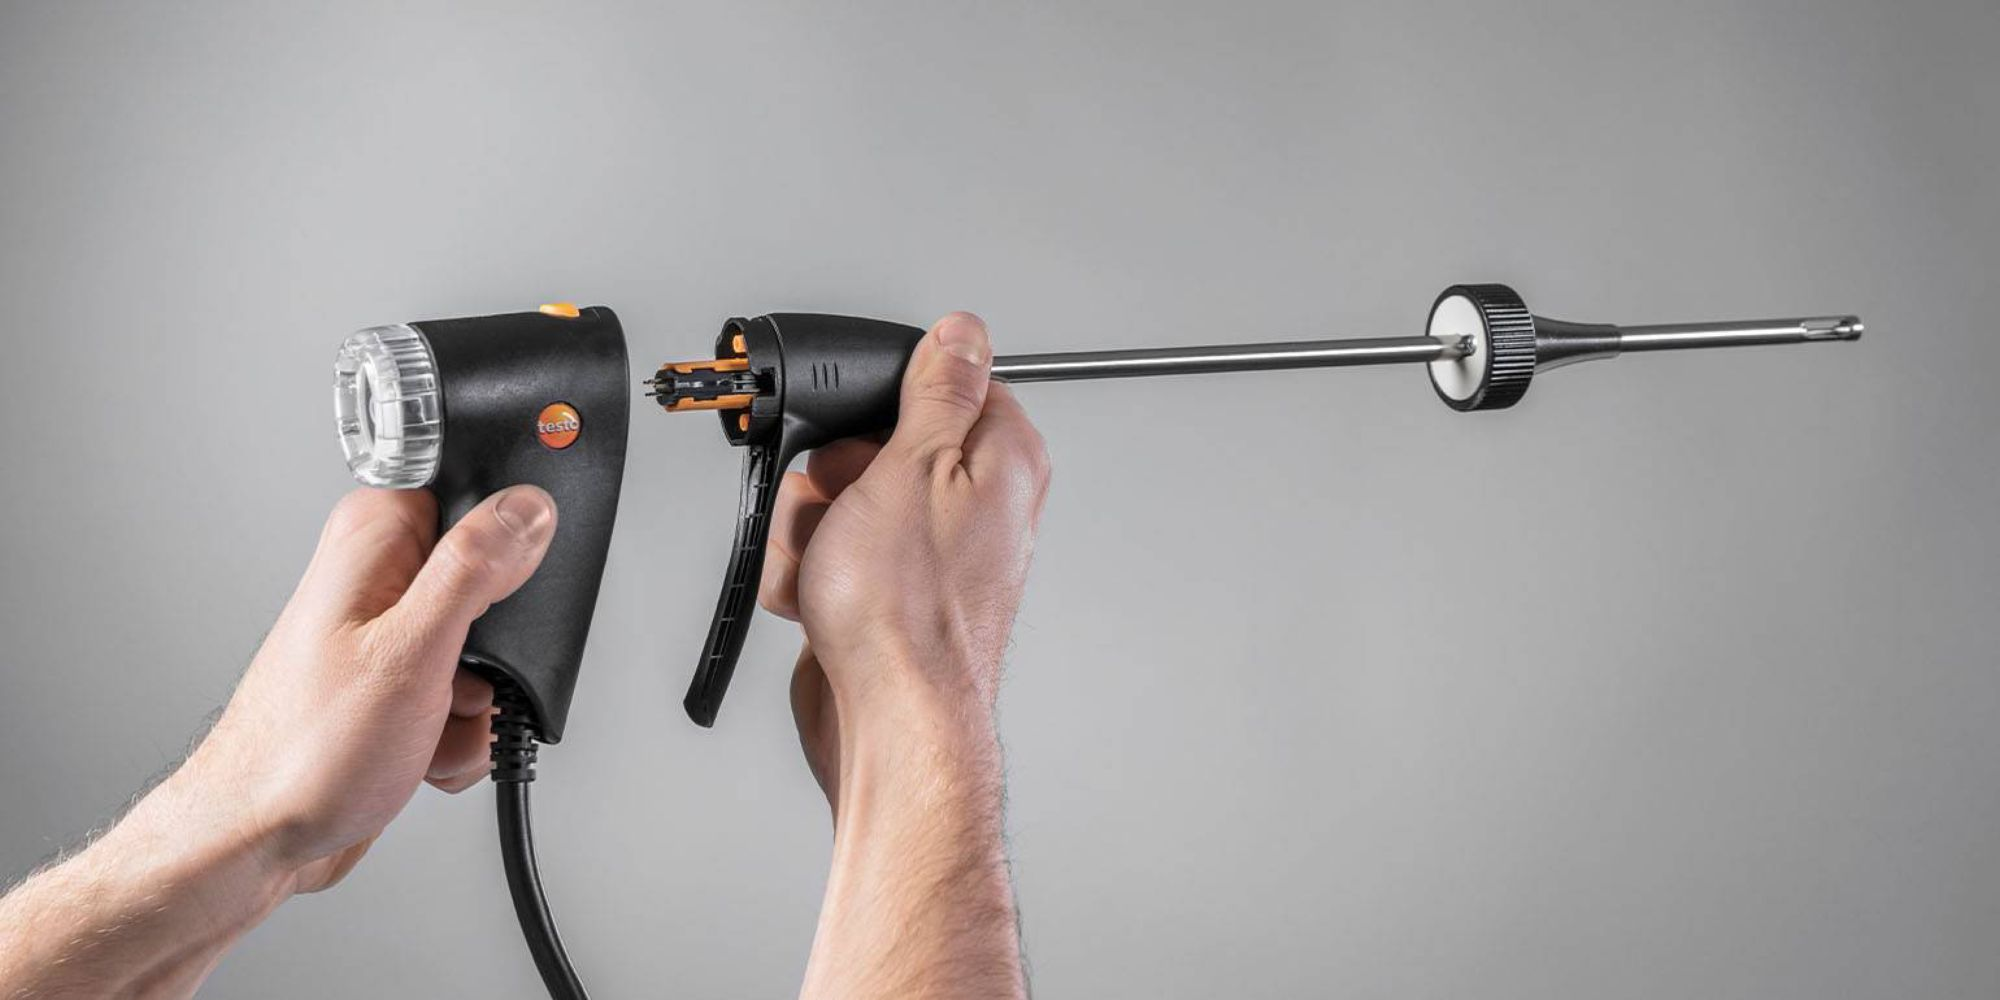 Probe handle Testo flue gas analyzer